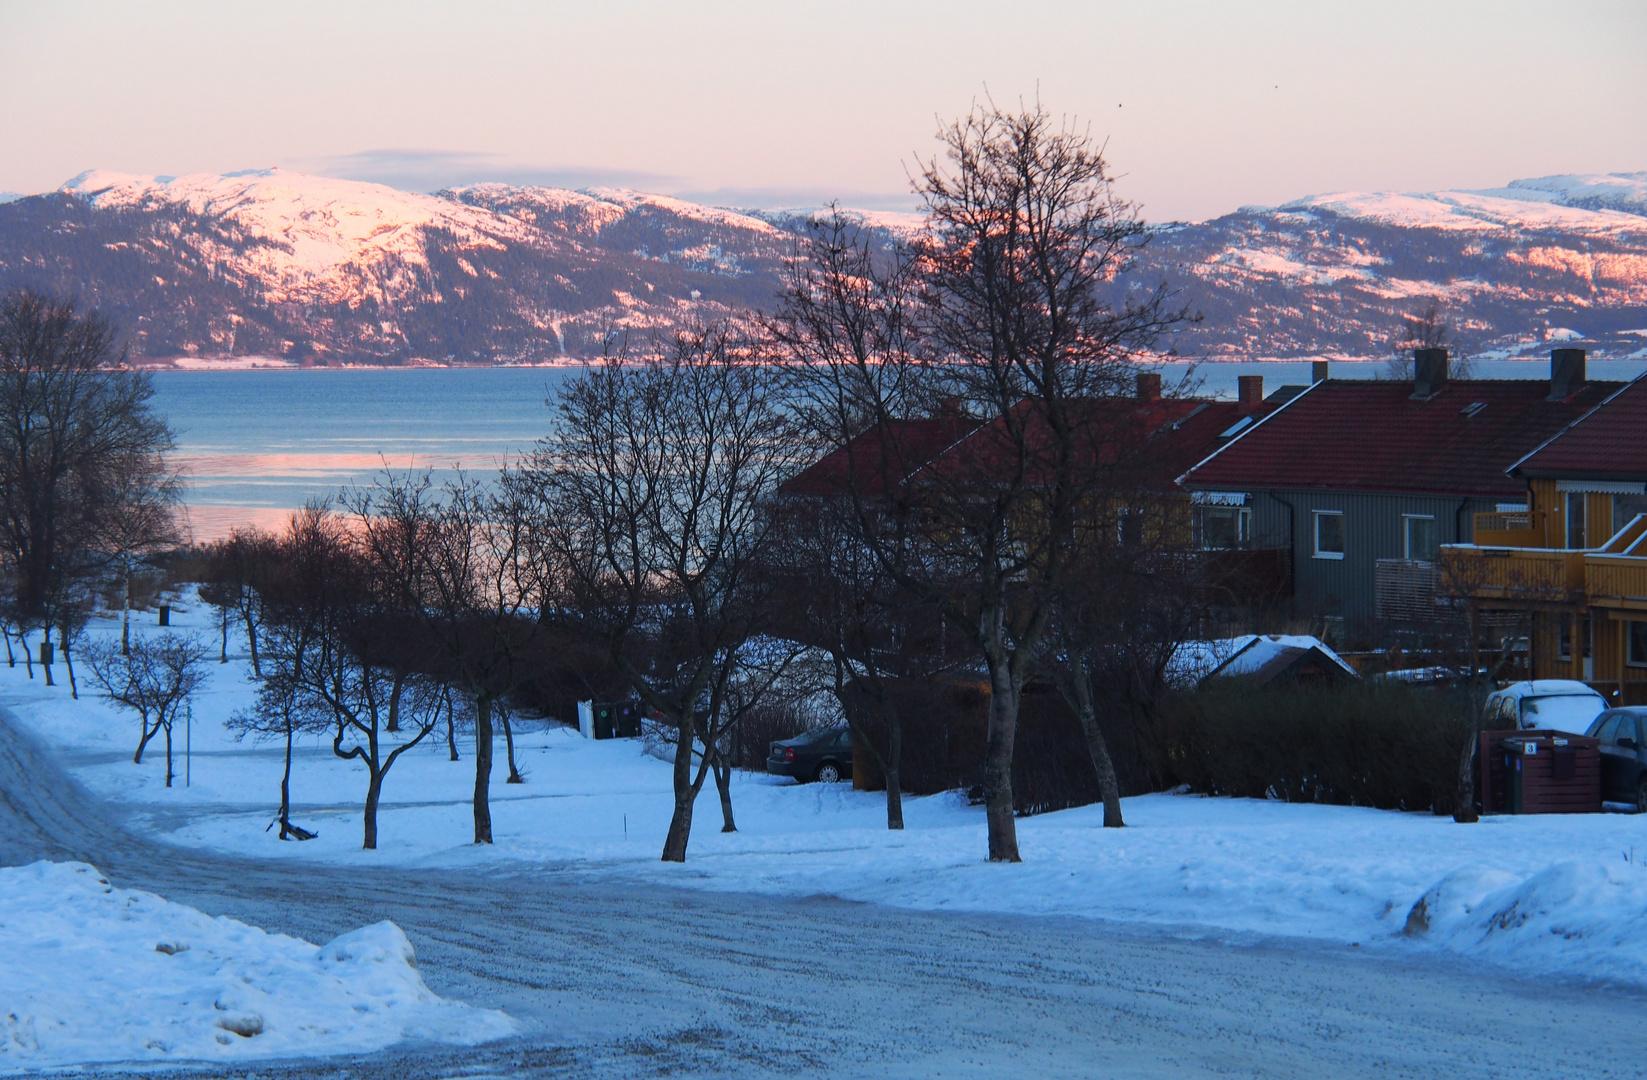 Morgensonne am Trondheimsfjord